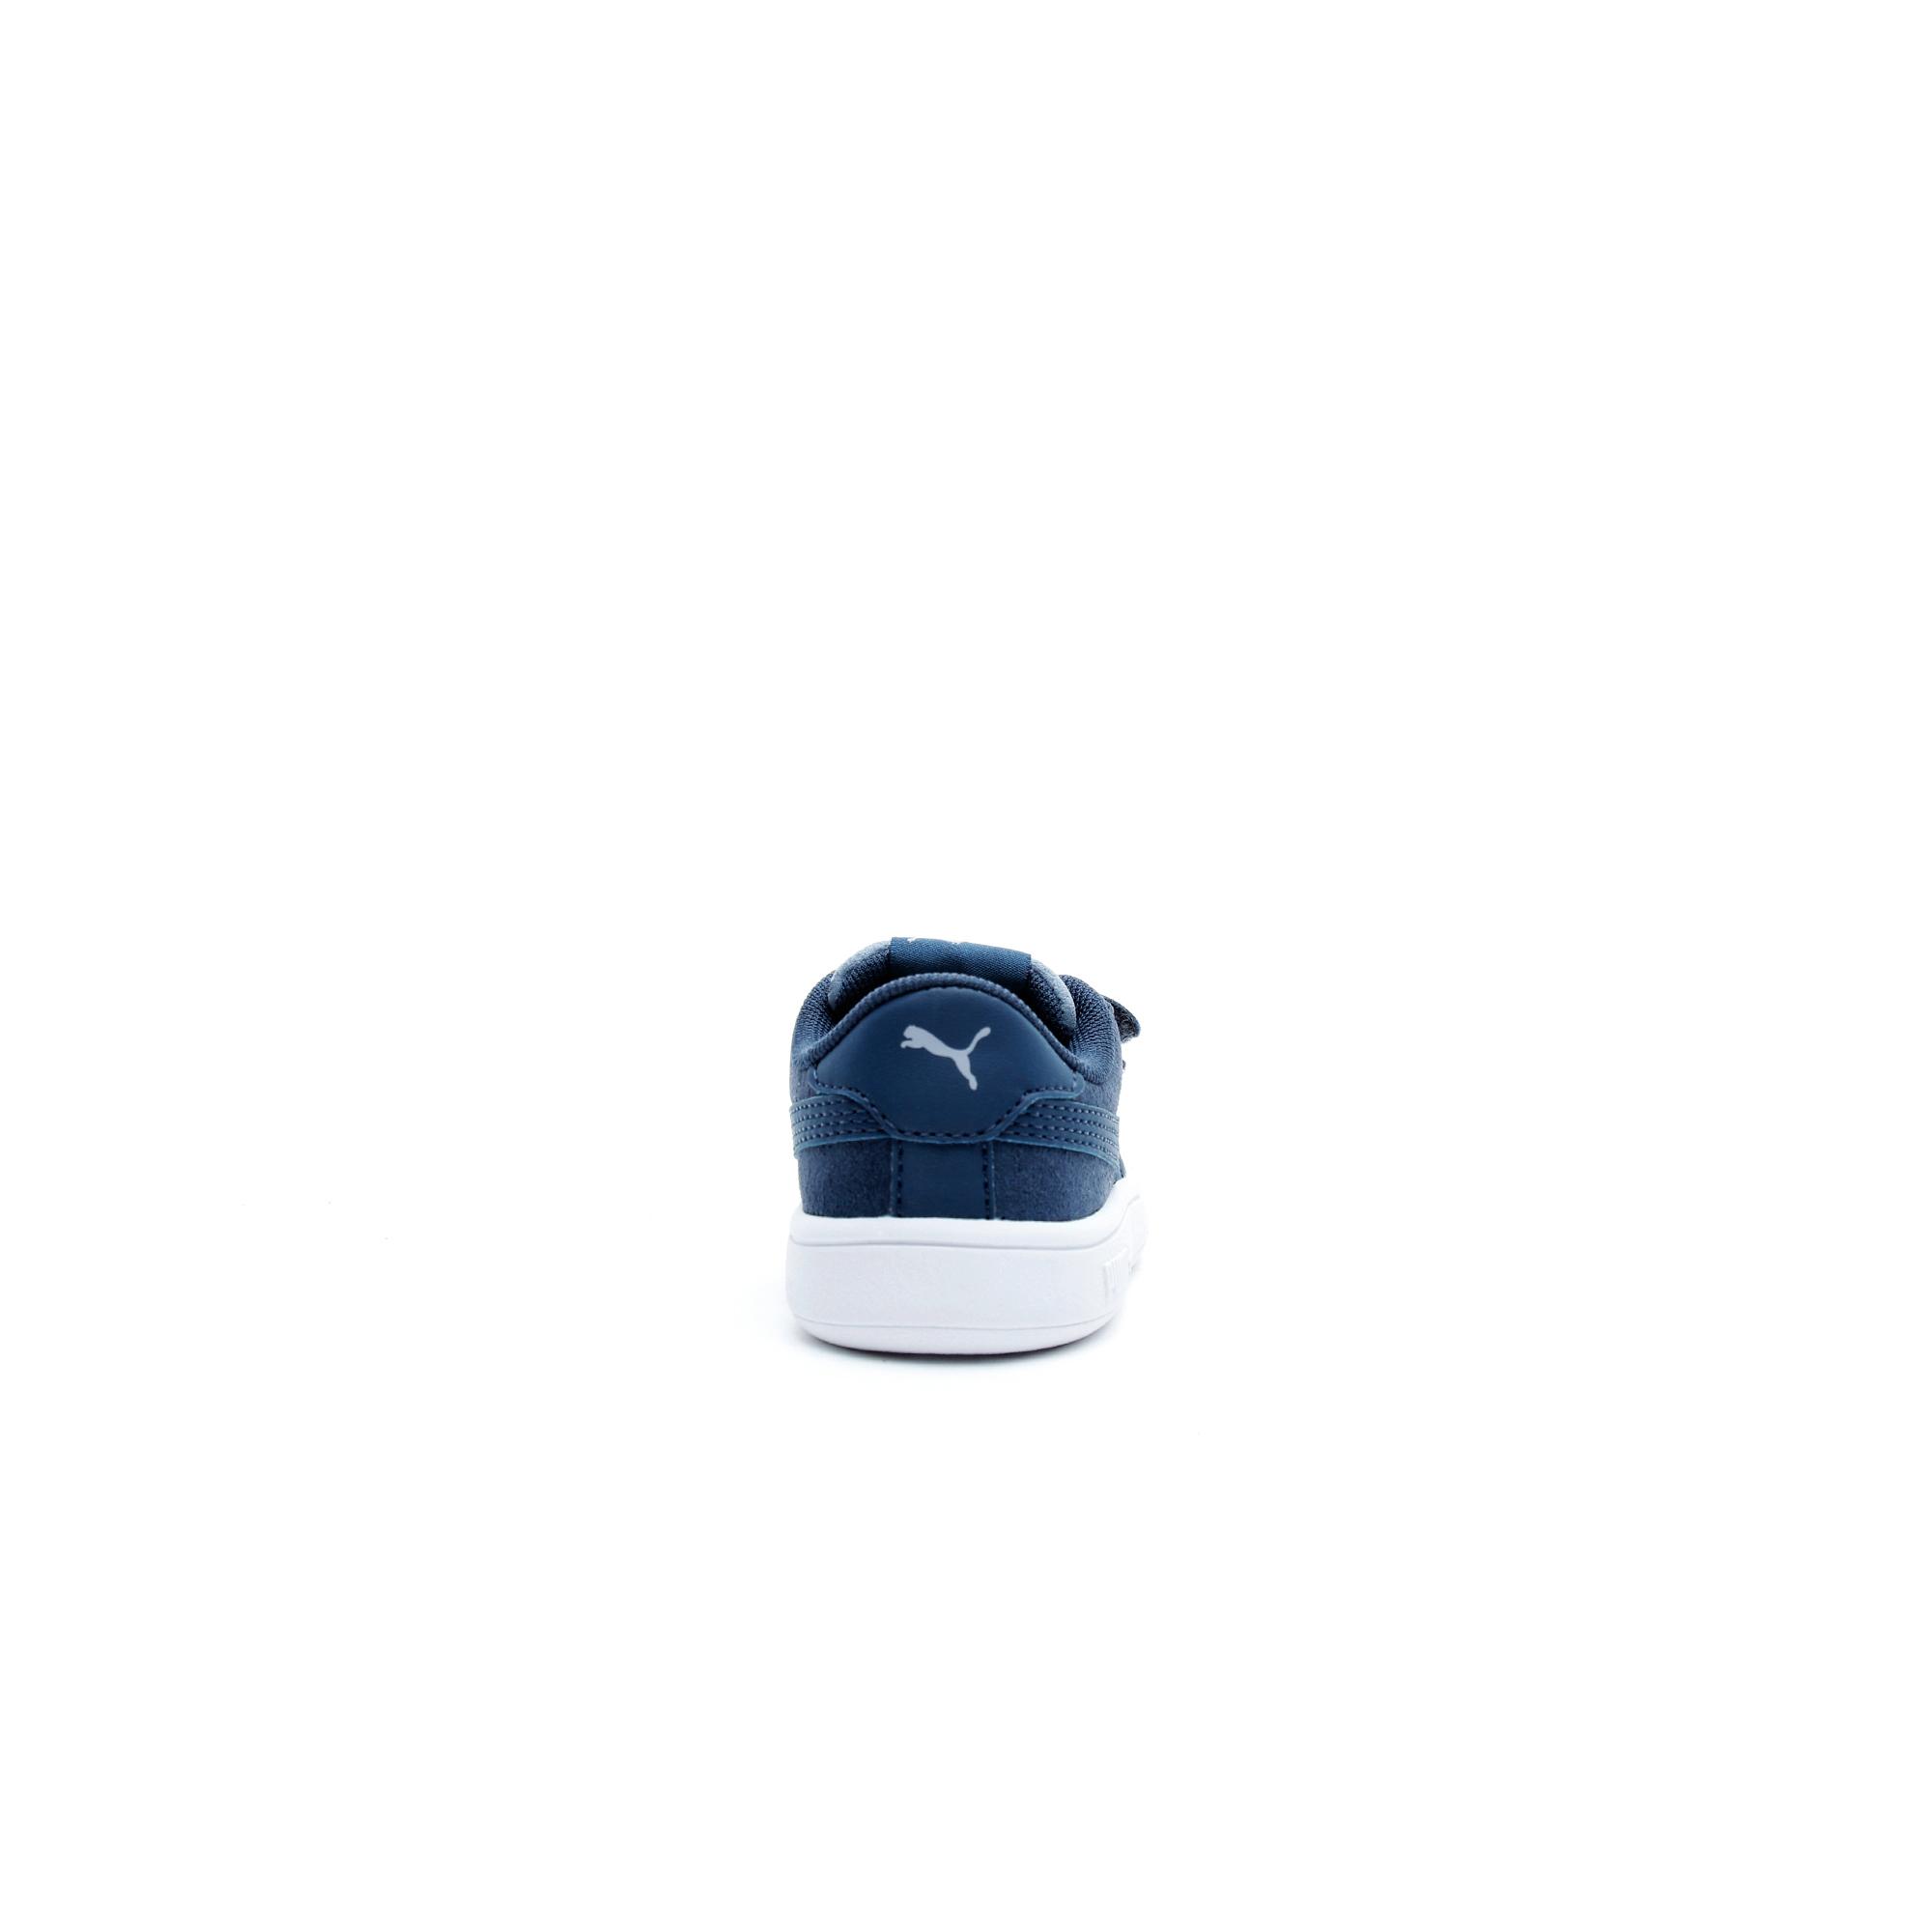 Puma Smash V2 Monster Bebek Mavi Spor Ayakkabı